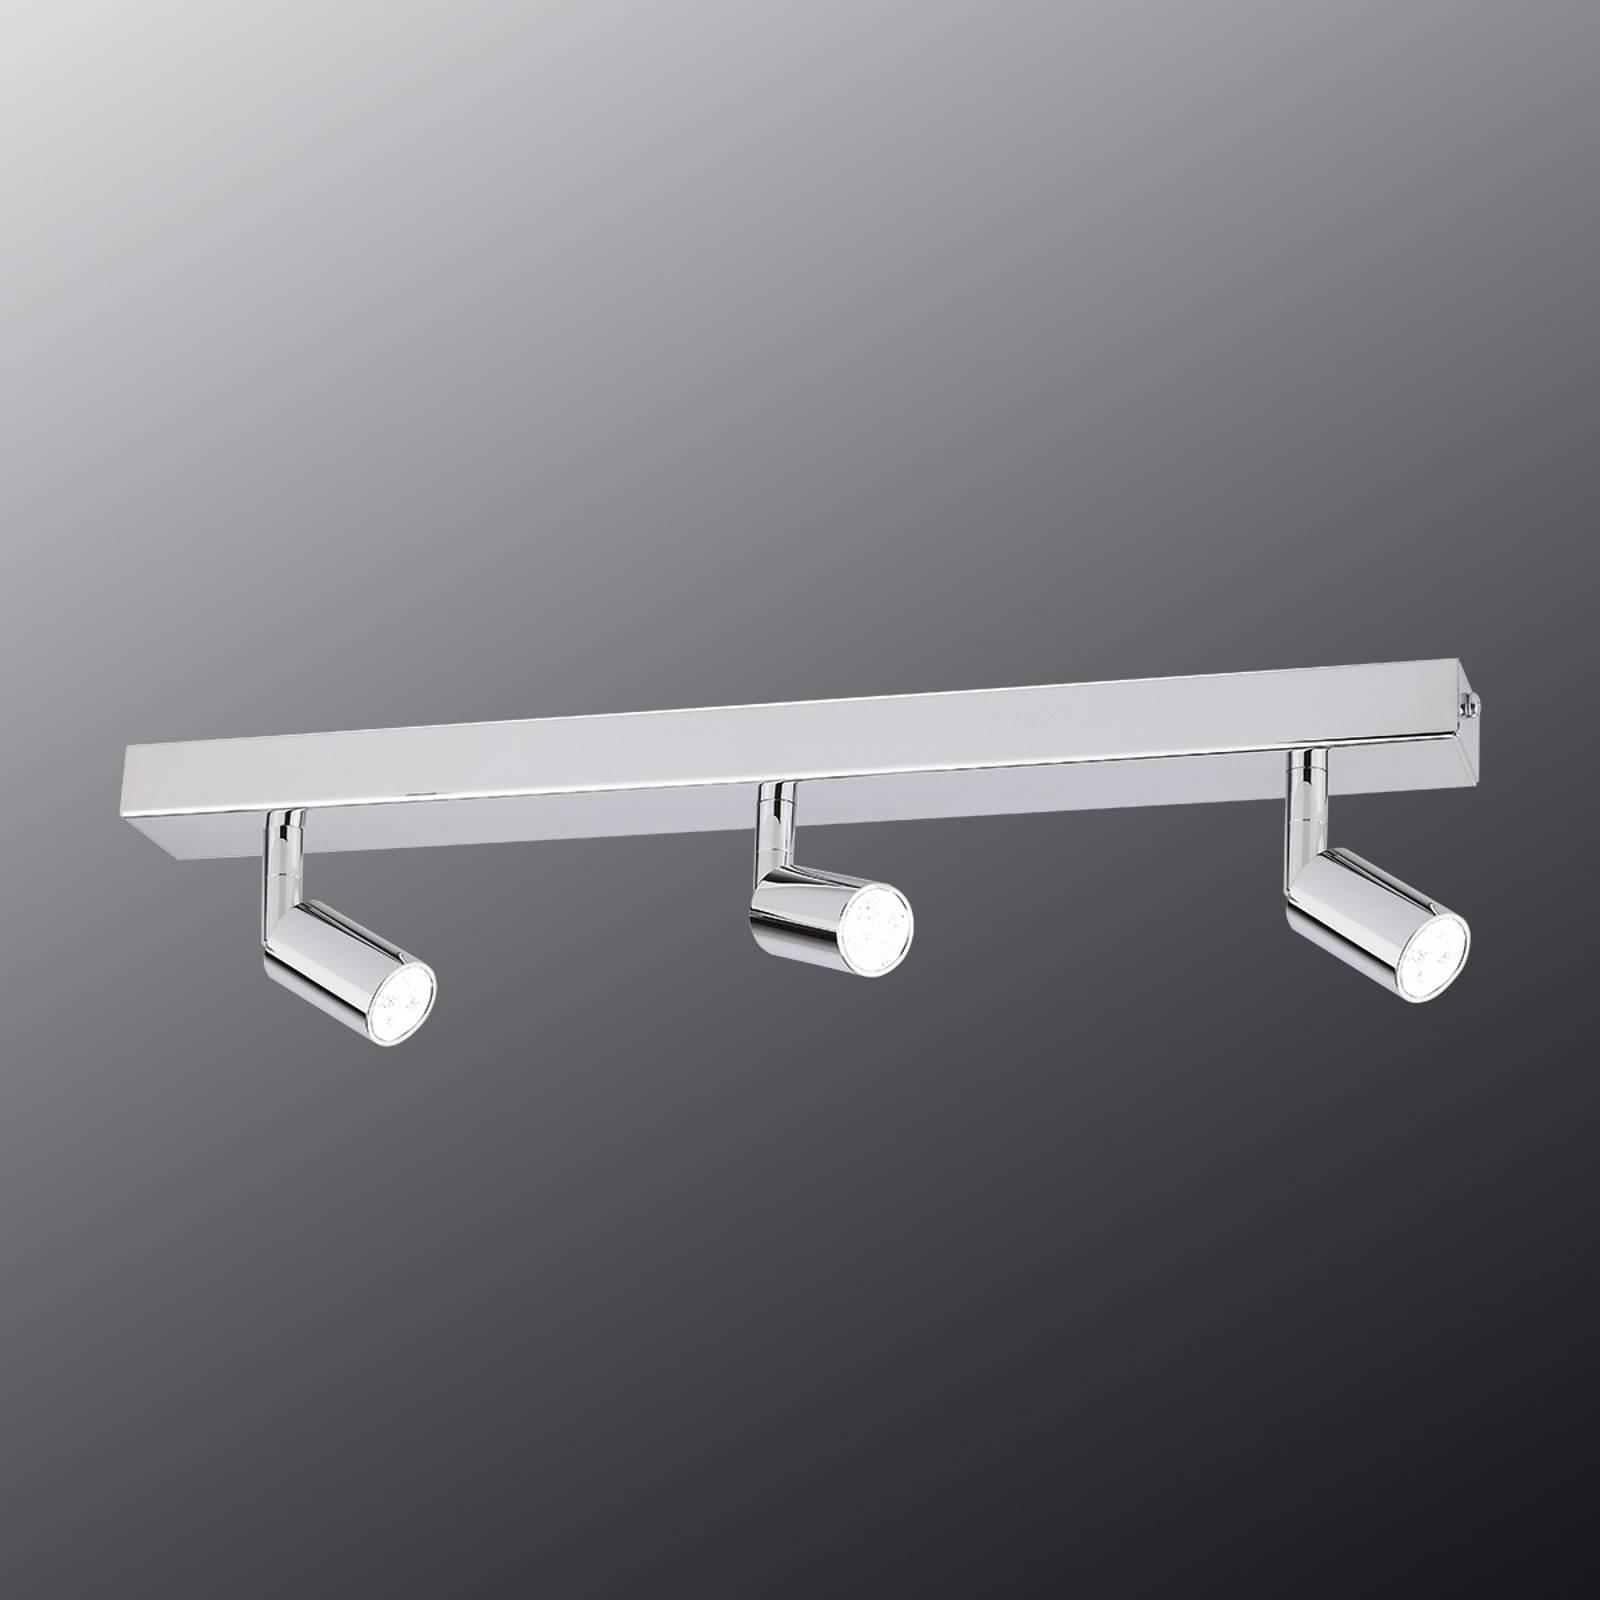 Moderne taklampe med LED-list og tre lys